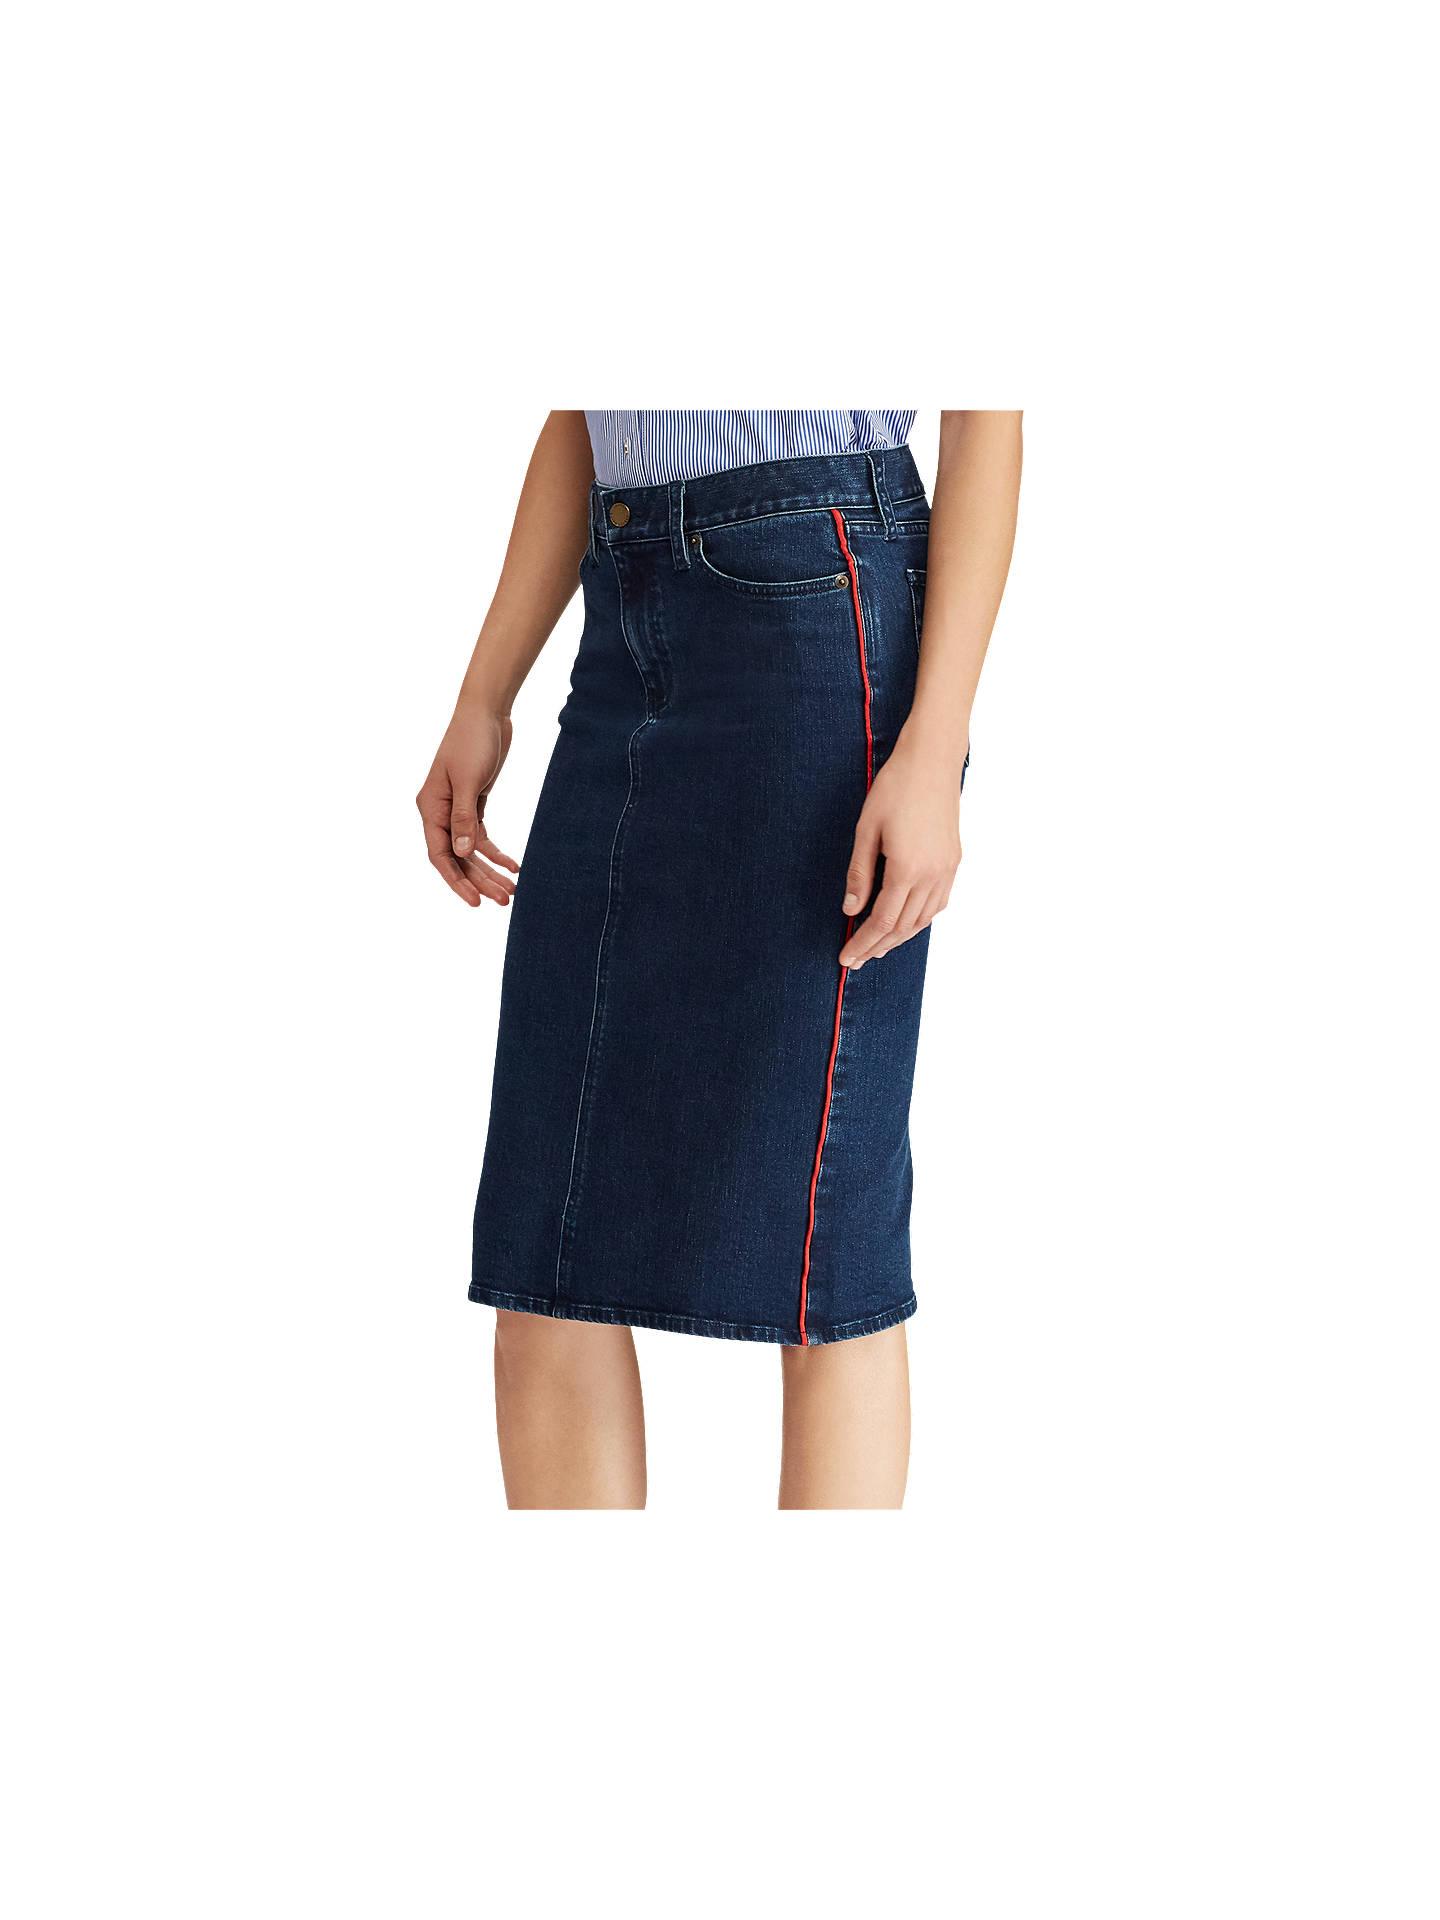 d1aeee3182 Lauren Ralph Lauren Daniela Denim Skirt, Nautical Blue at John Lewis ...